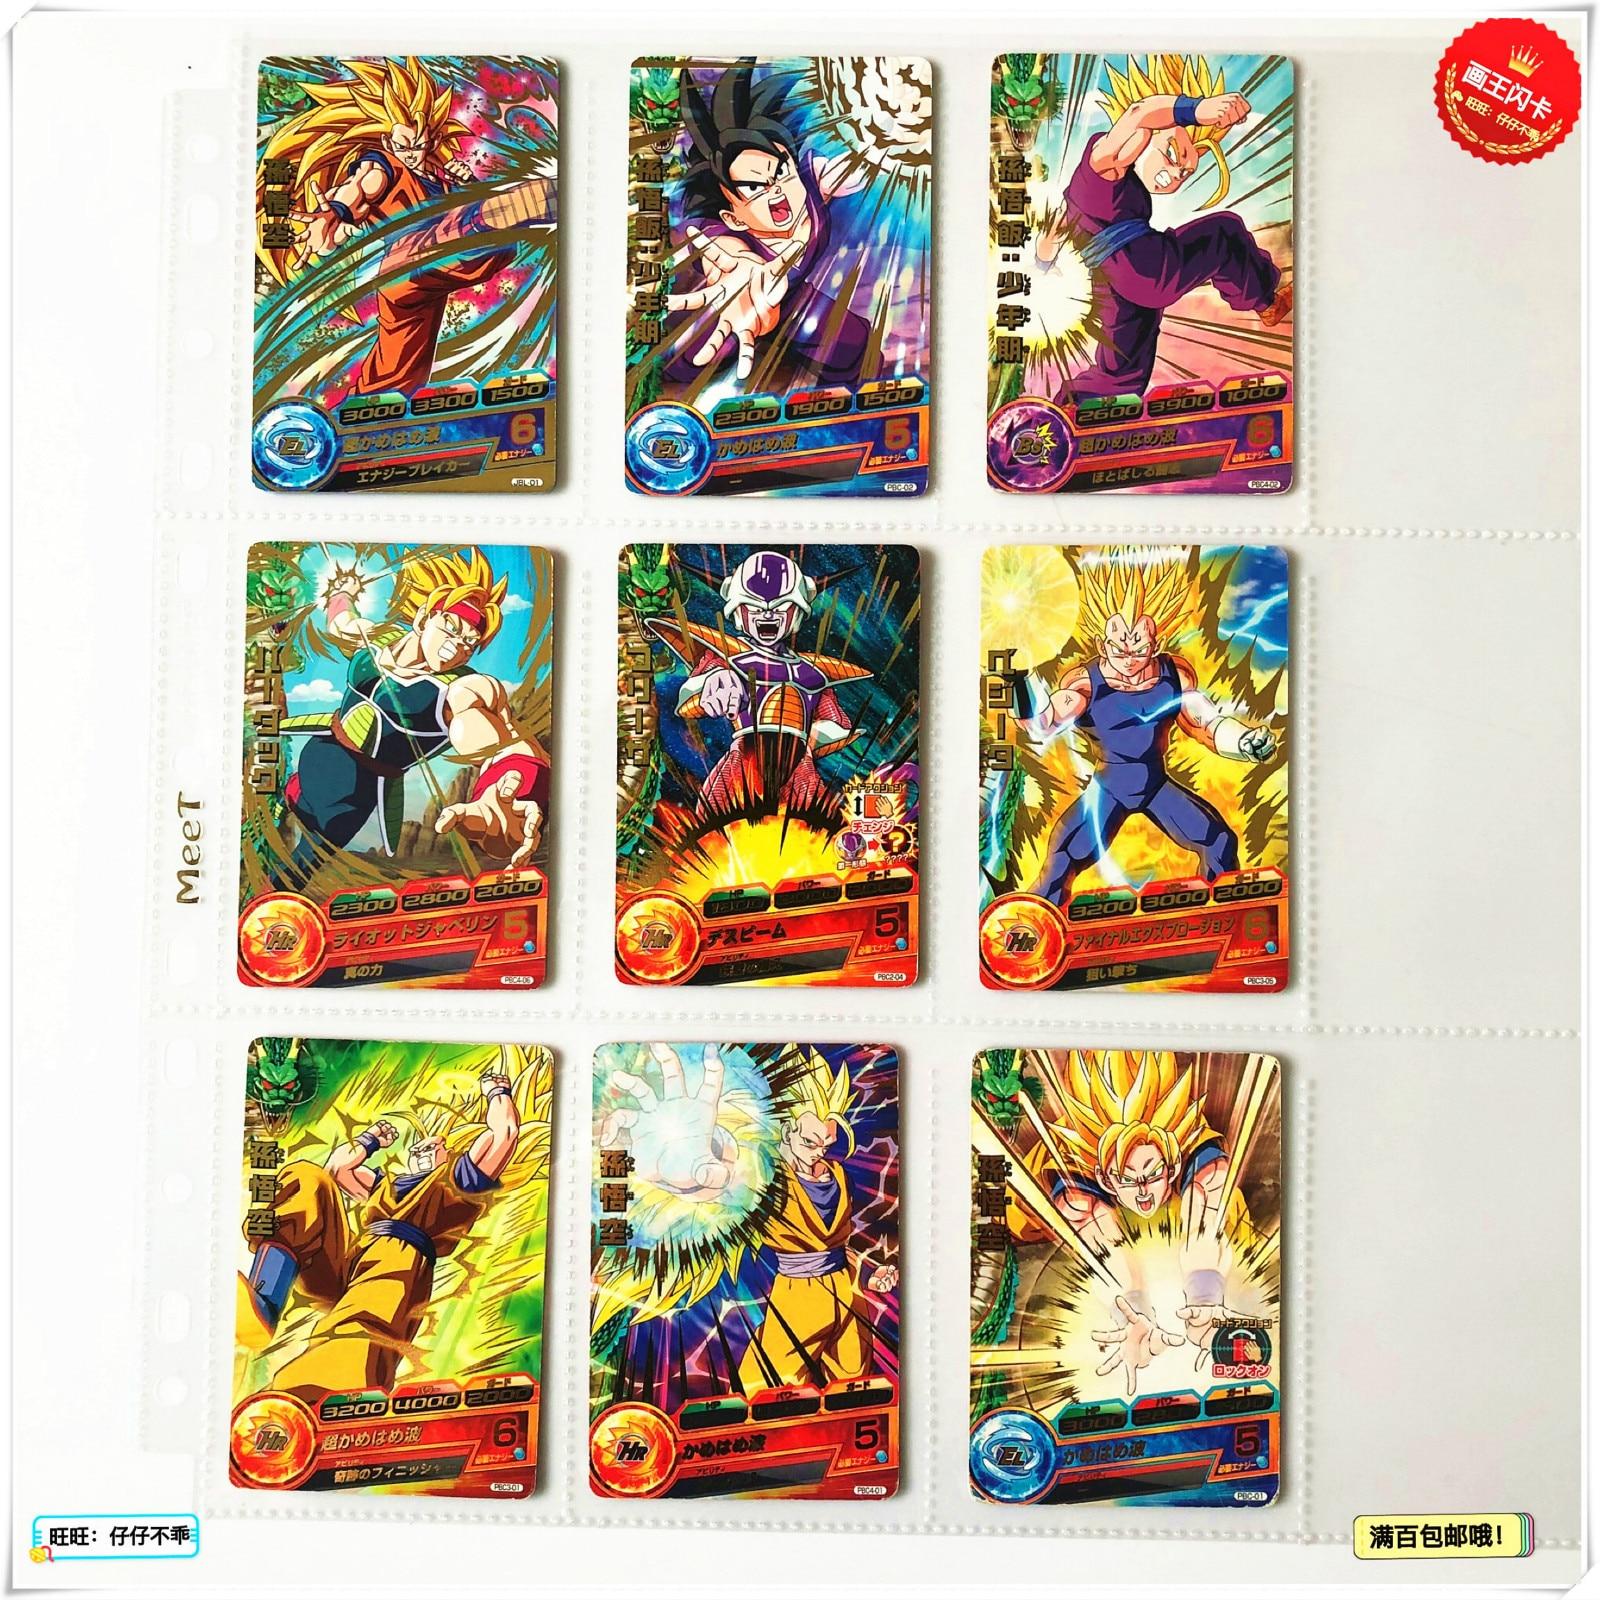 Japan Original Dragon Ball Hero Card PBC Goku Toys Hobbies Collectibles Game Collection Anime Cards